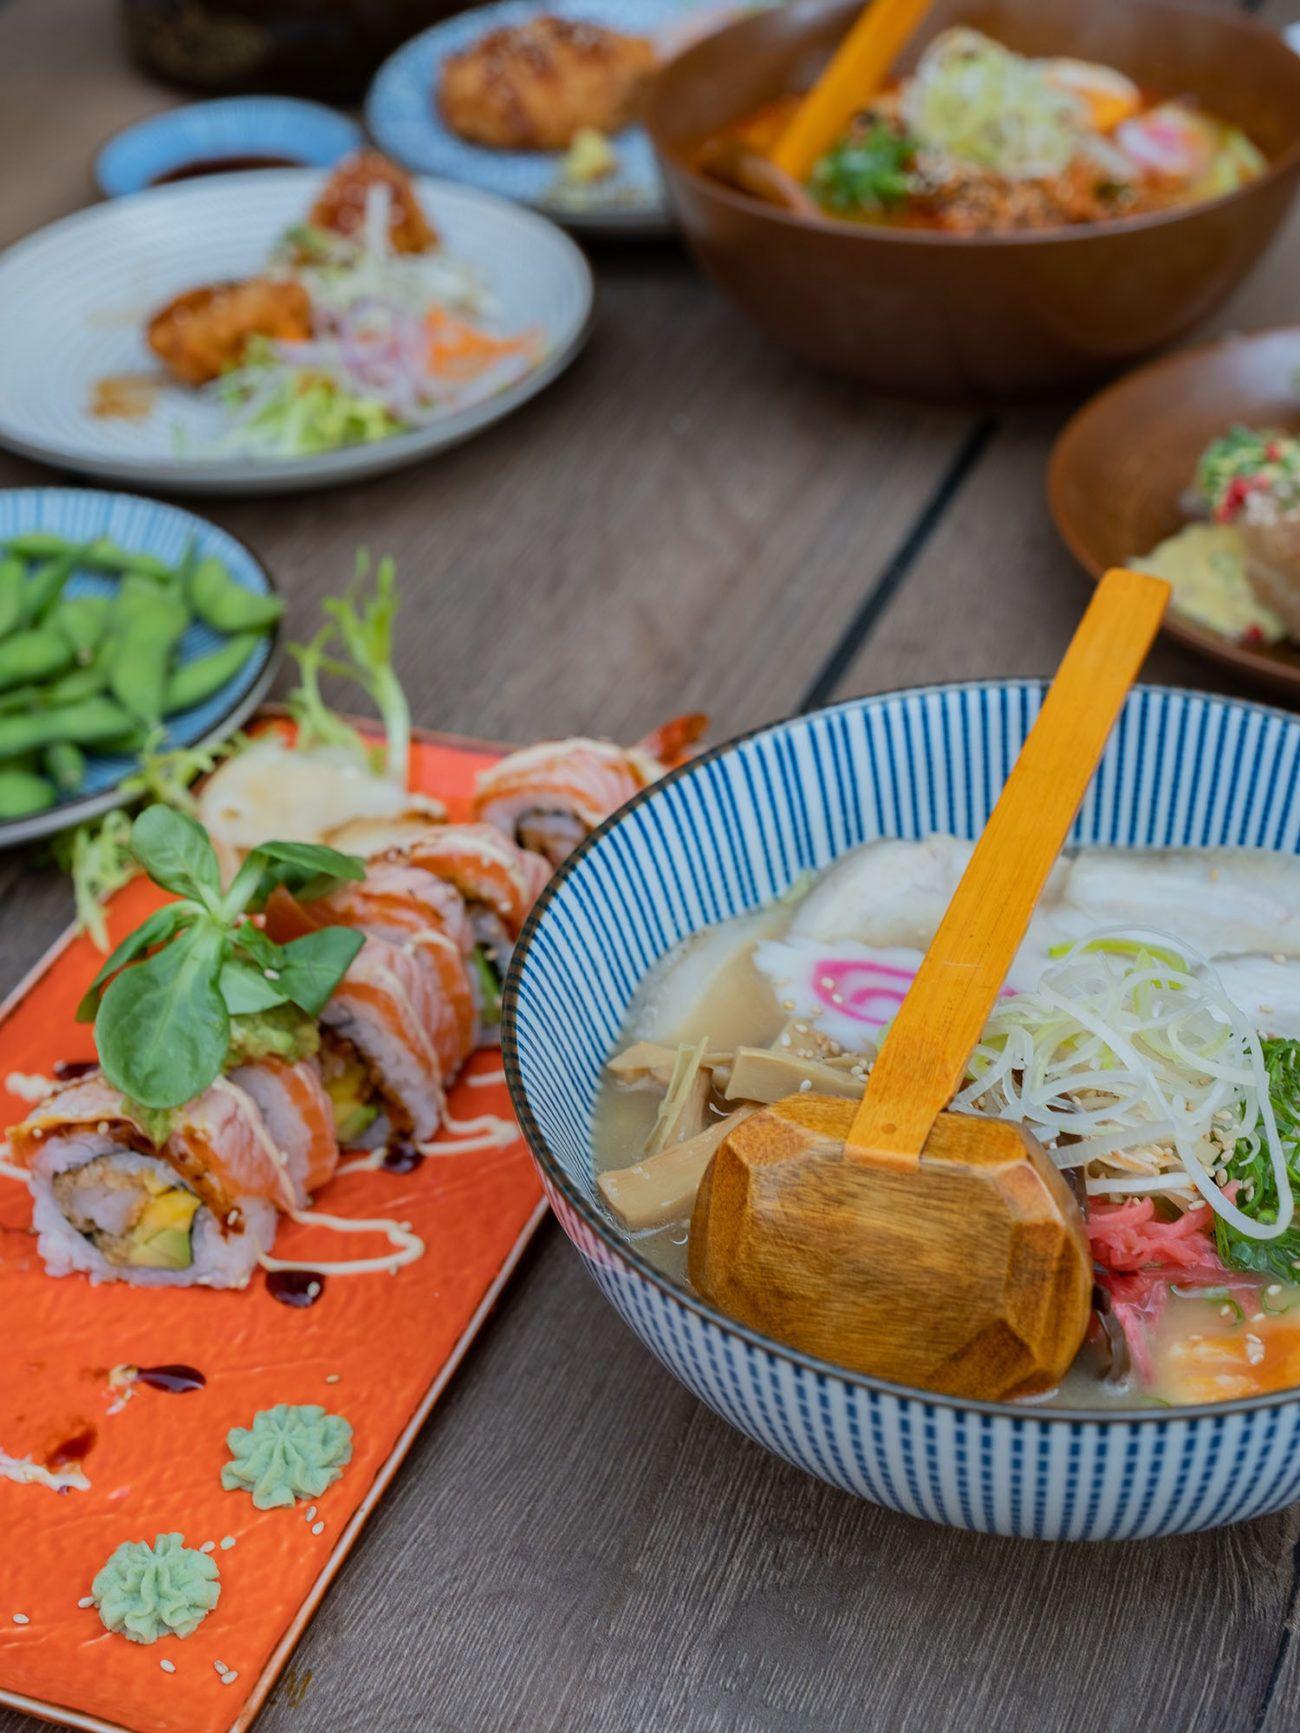 Foodblog About Fuel, Restaurant CHOTTO Berlin, Ramen, Sushi